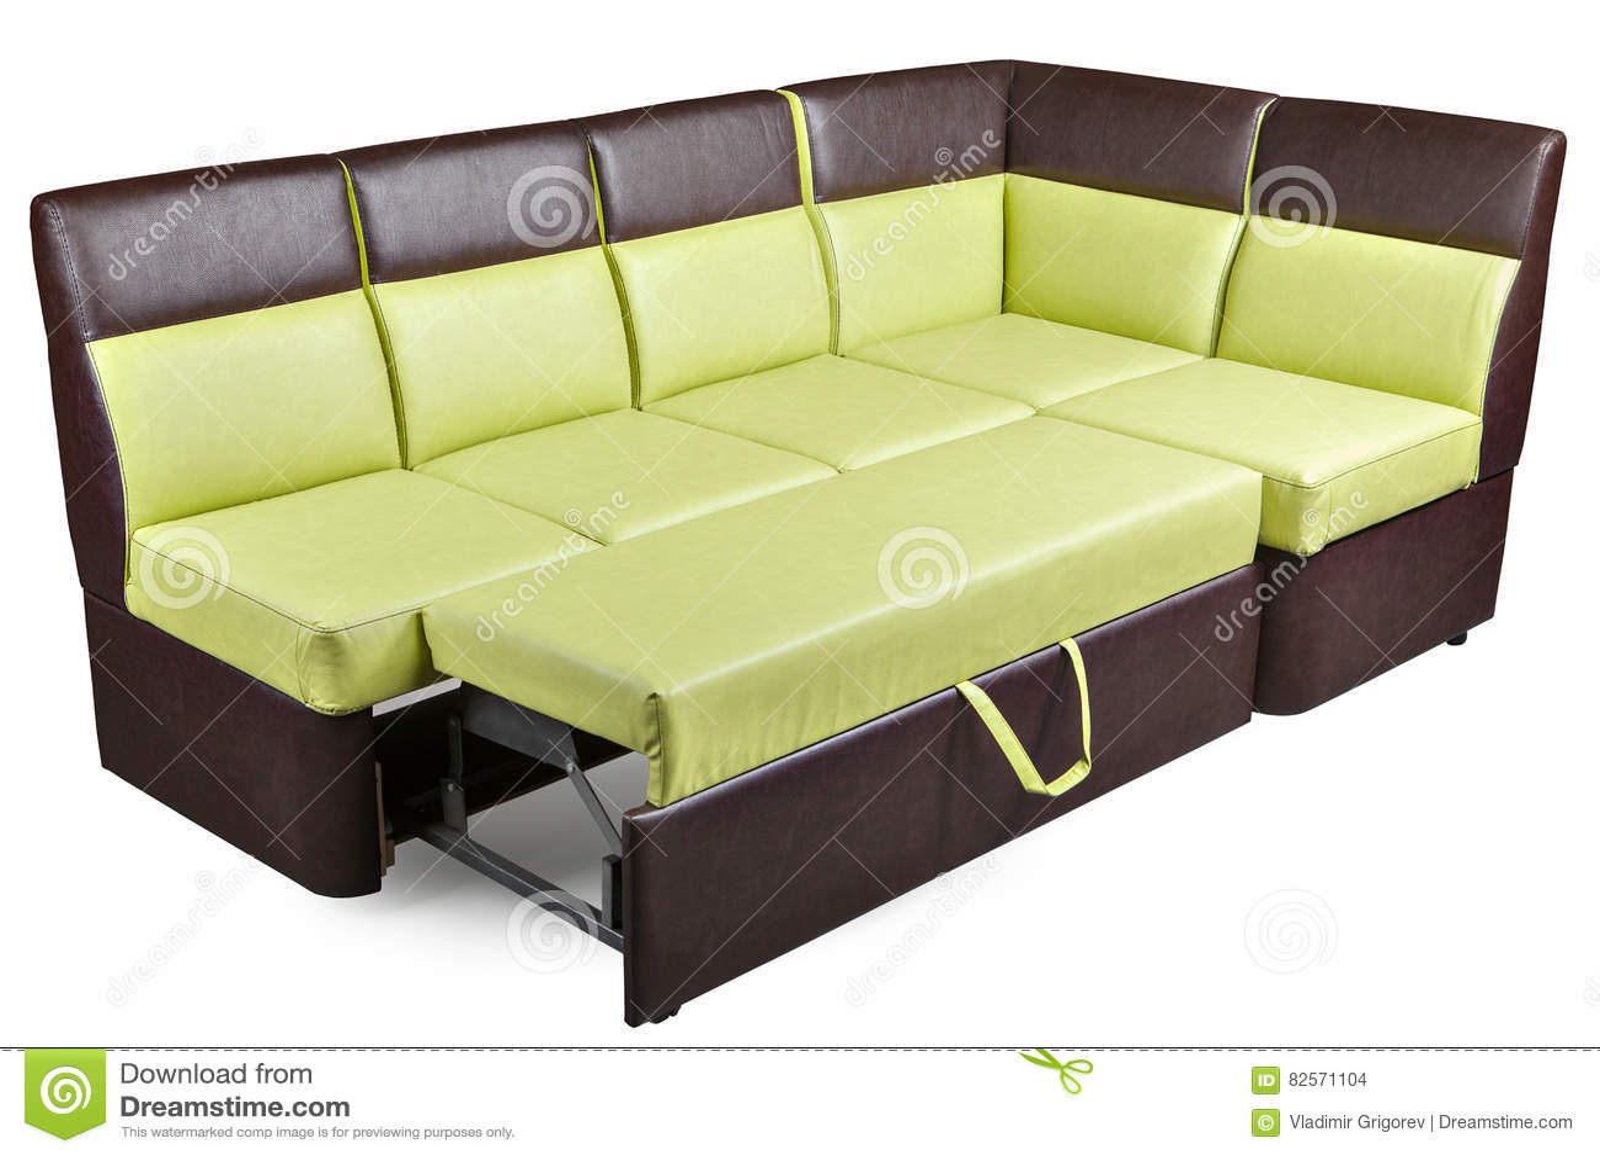 Shaped Sleeper L Sectional Sofa